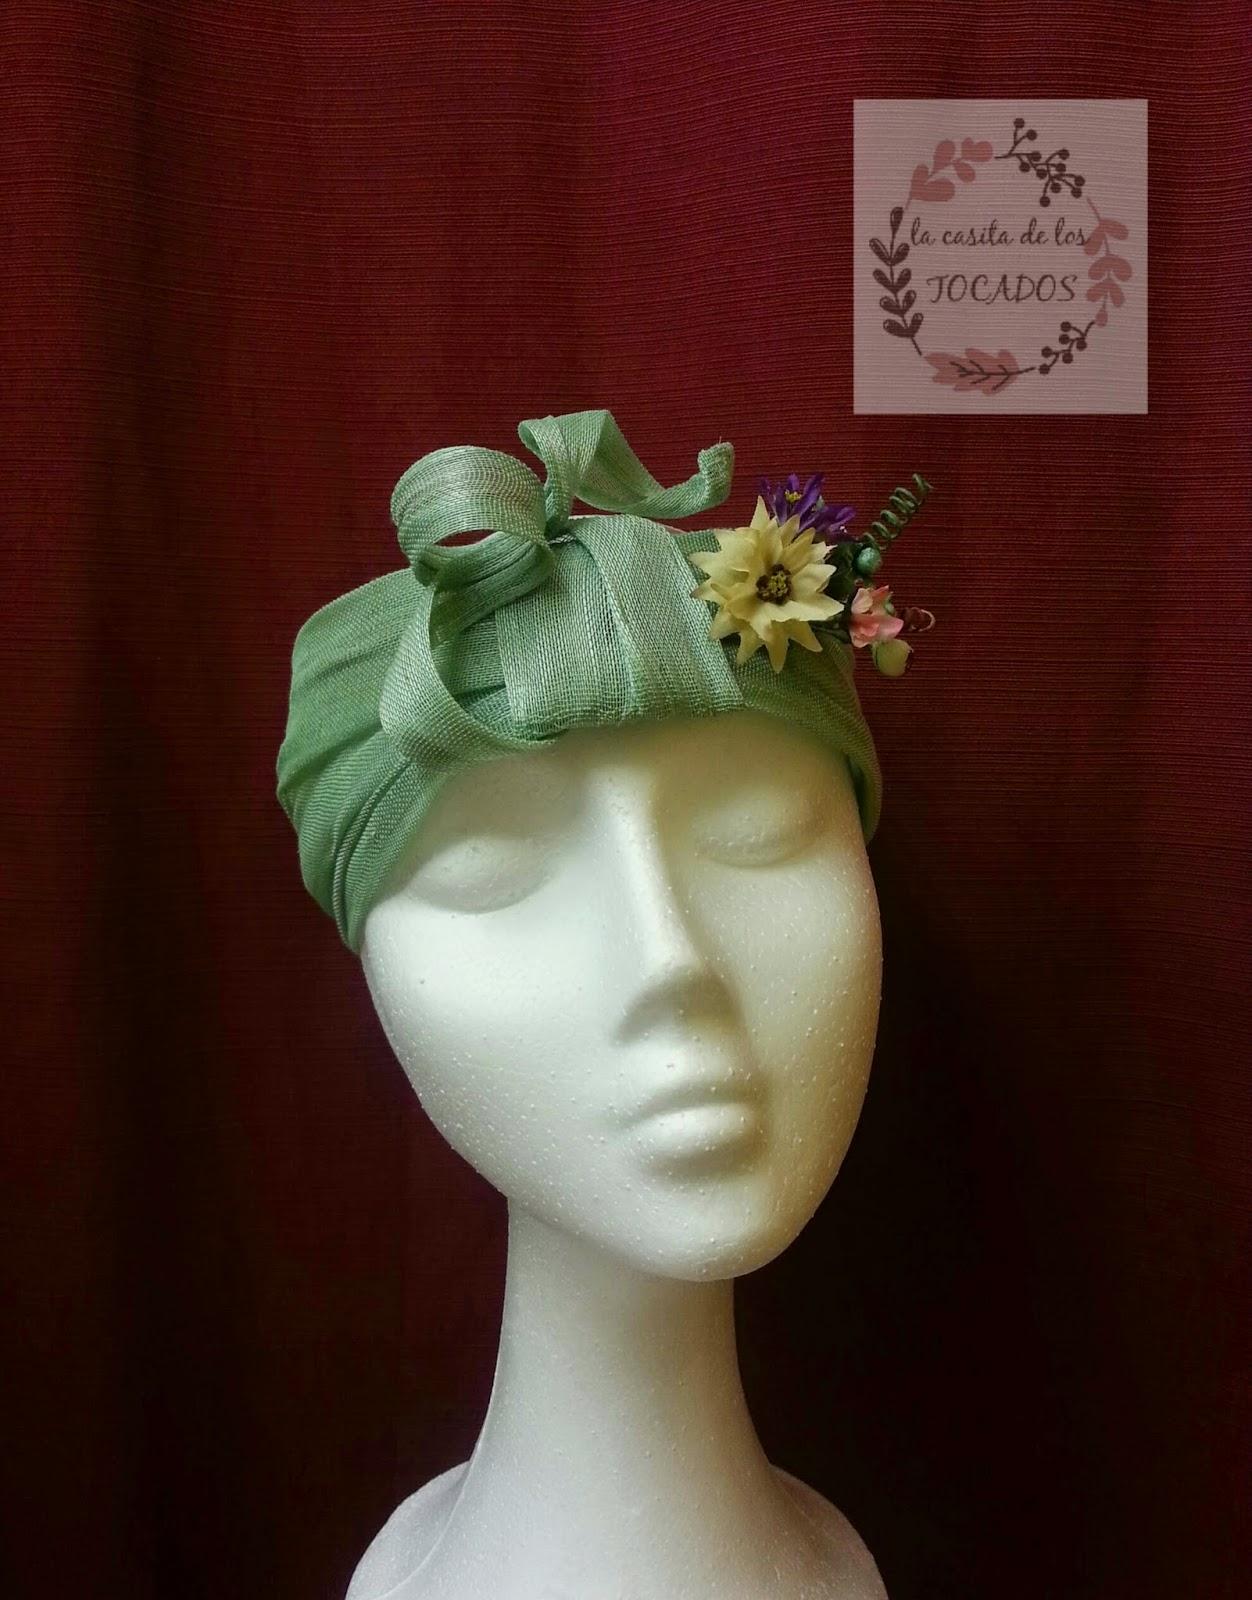 turbante verde con flores